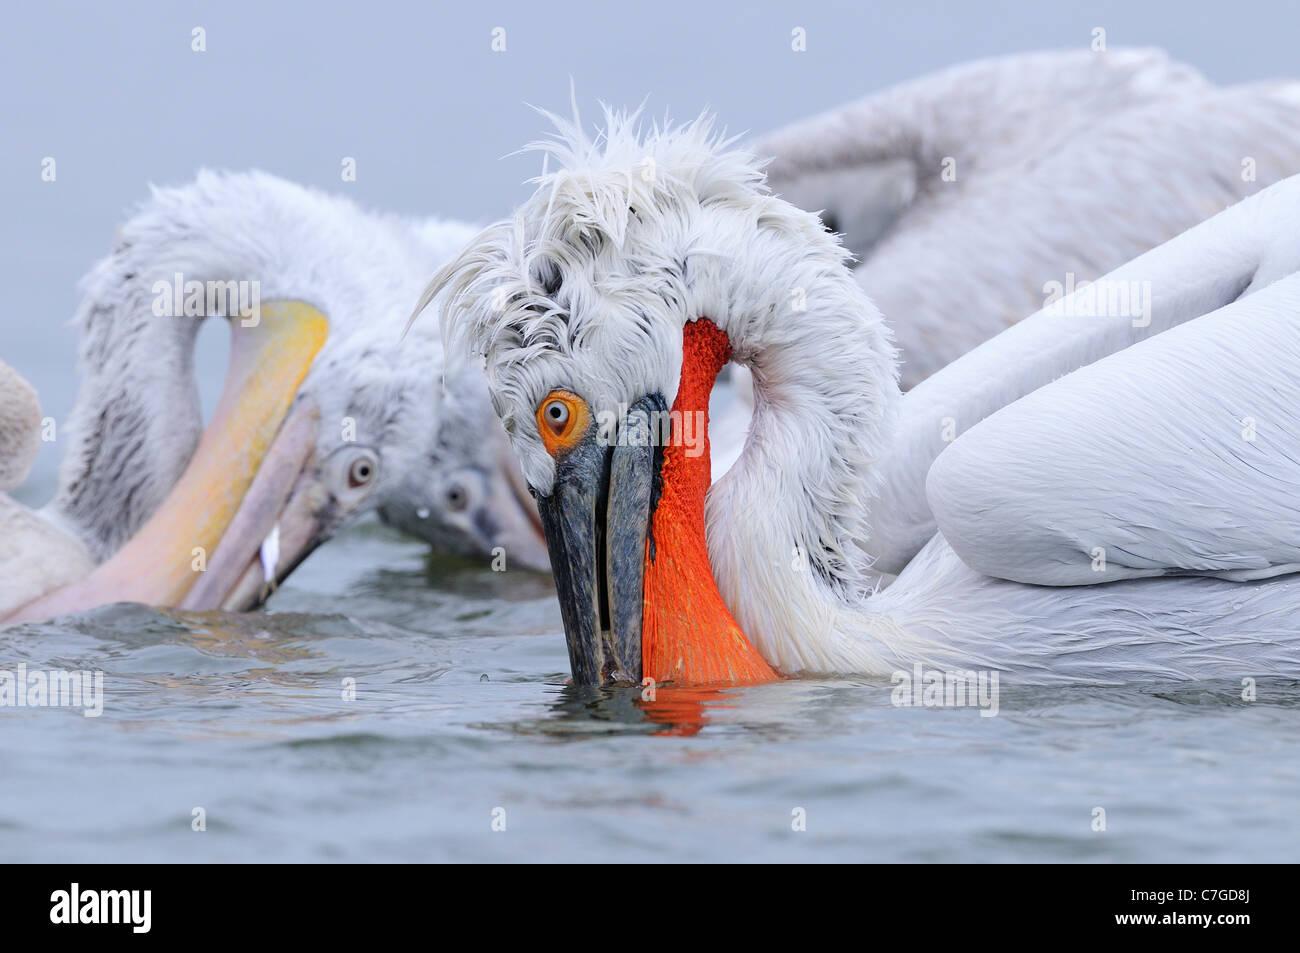 Dalmatian Pelican (Pelecanus crispus) adult and juvenile feeding in water, Lake Kerkini, Greece - Stock Image